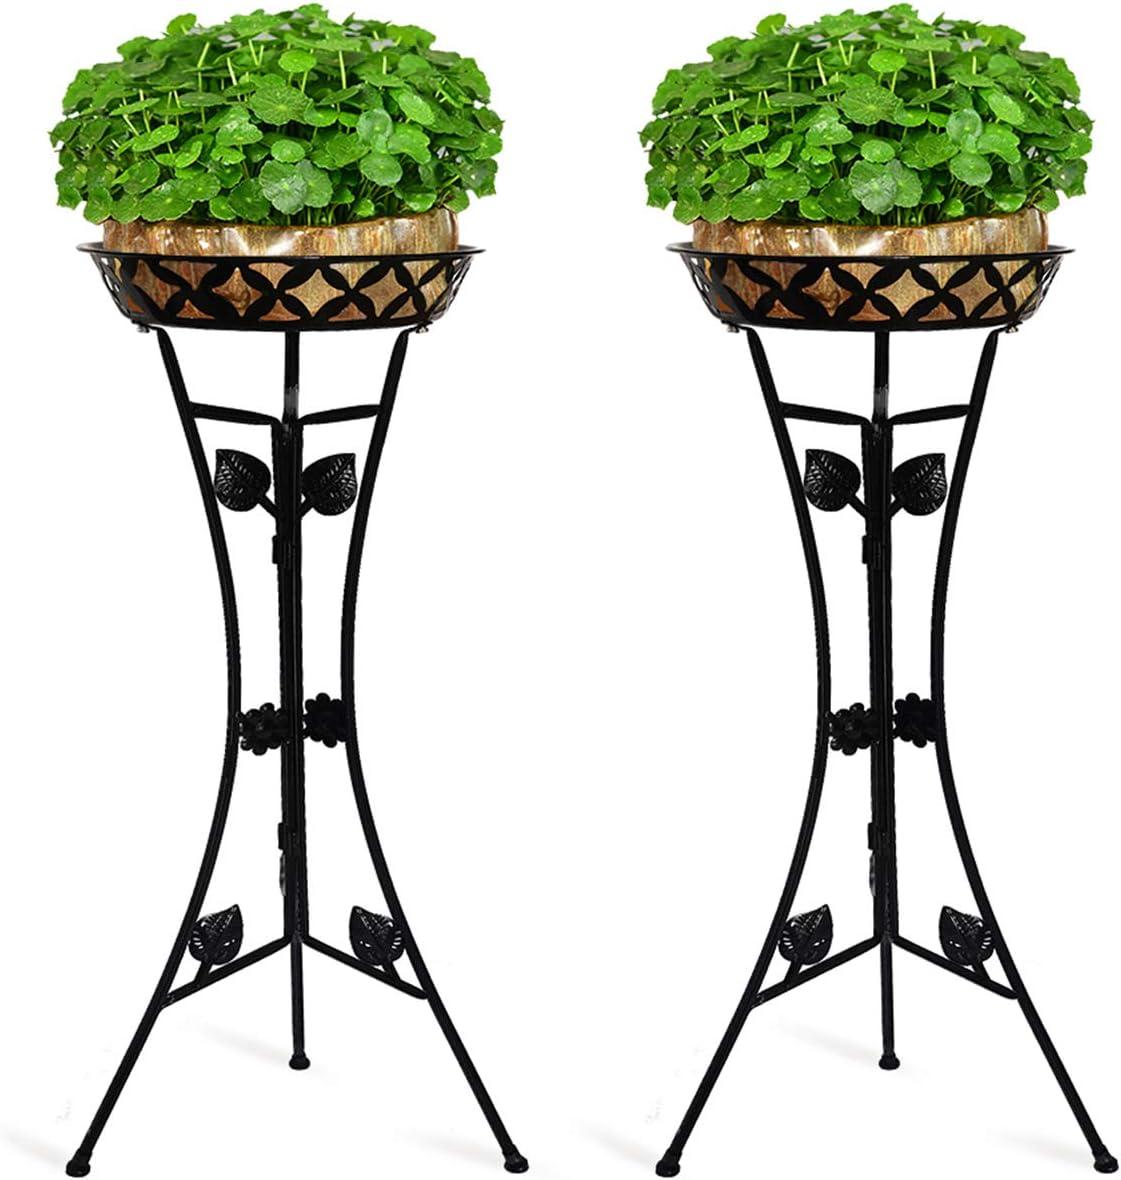 JzNova 2 Pack Metal Tall Plant Stand, Flower Pot Raised Holder, Iron Art Triangle Support Planter Holders, Outdoor & Indoor Elegant Corner Decorative Display Rack, Mordern Planter Container, Black